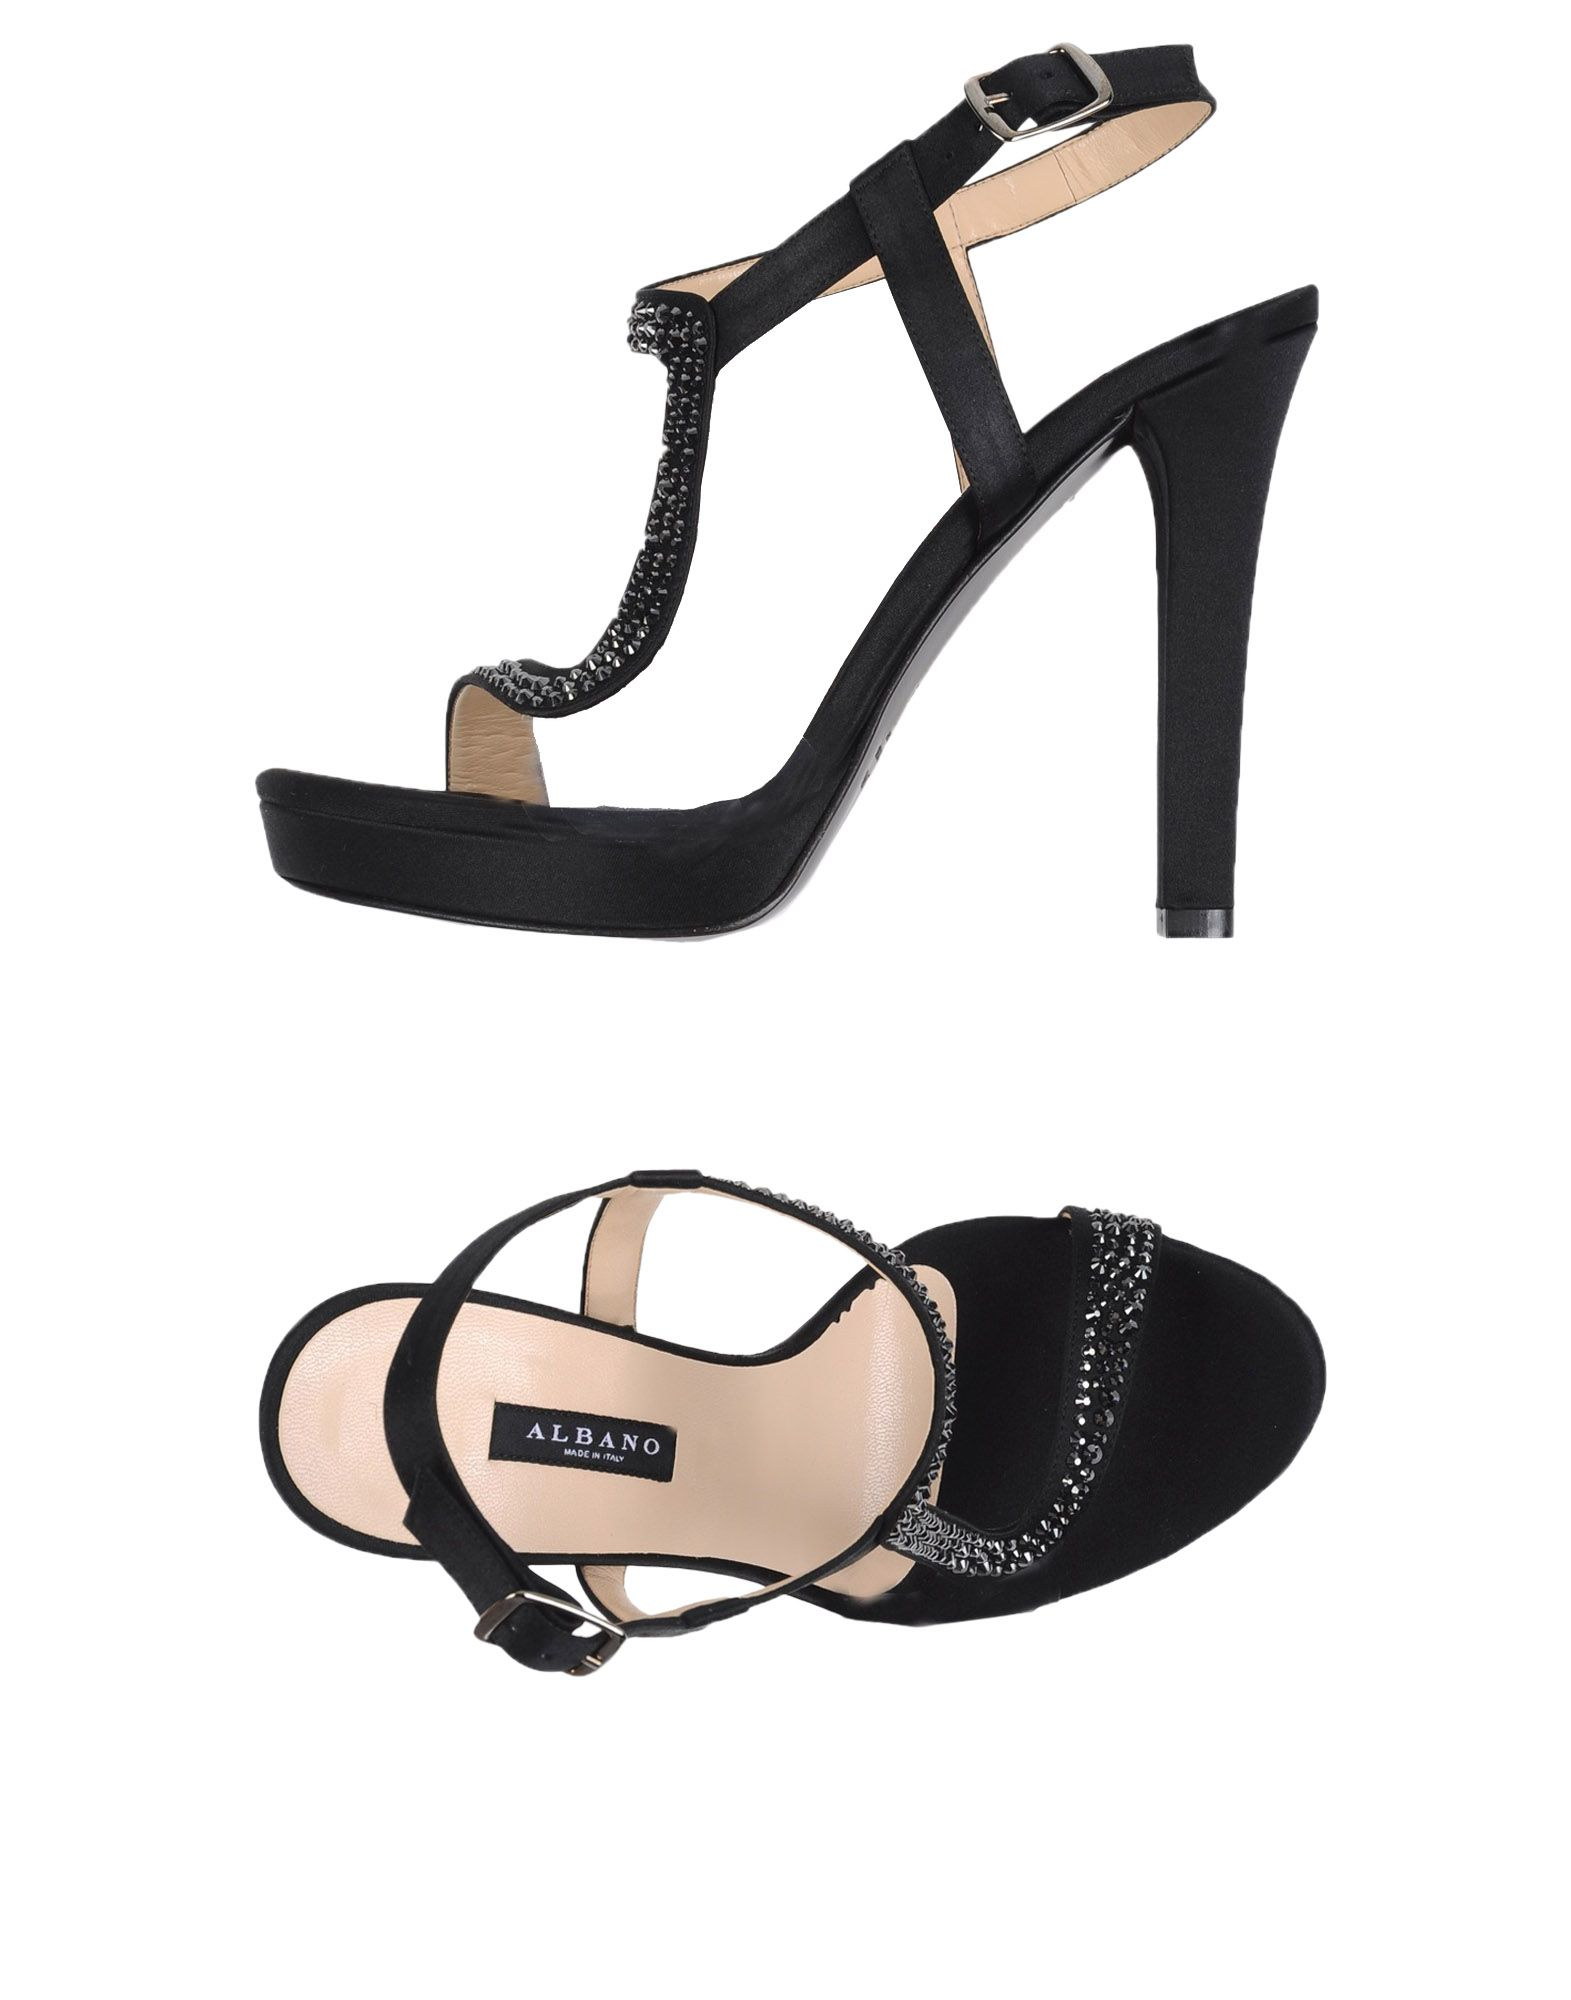 Albano Sandalen Damen  11167522DU Gute Qualität beliebte Schuhe